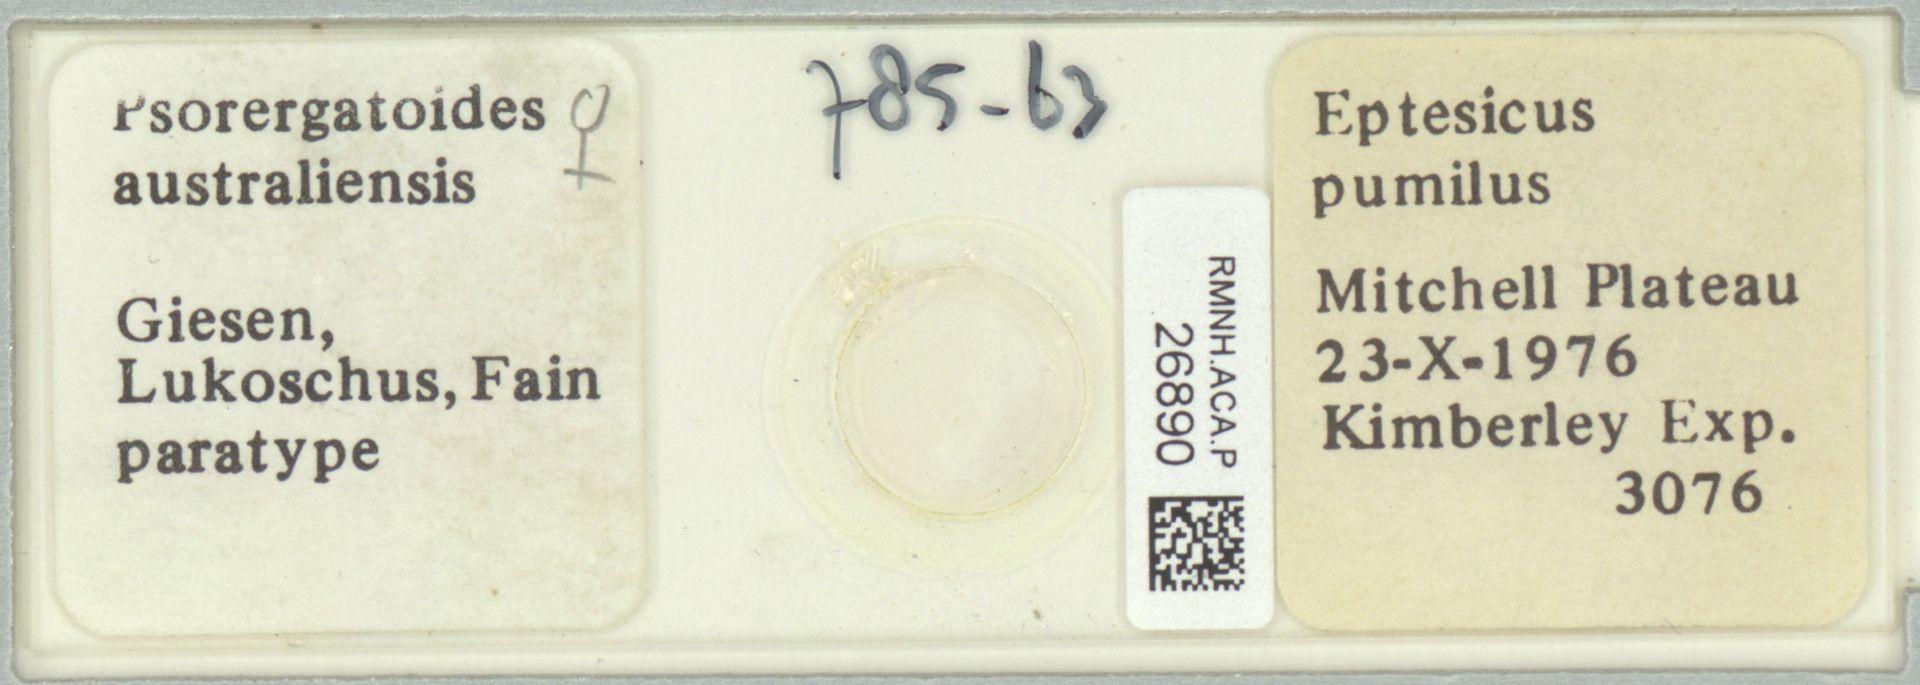 RMNH.ACA.P.26890   Psorergatoides australiensis Giesen, Lukoschus, Fain